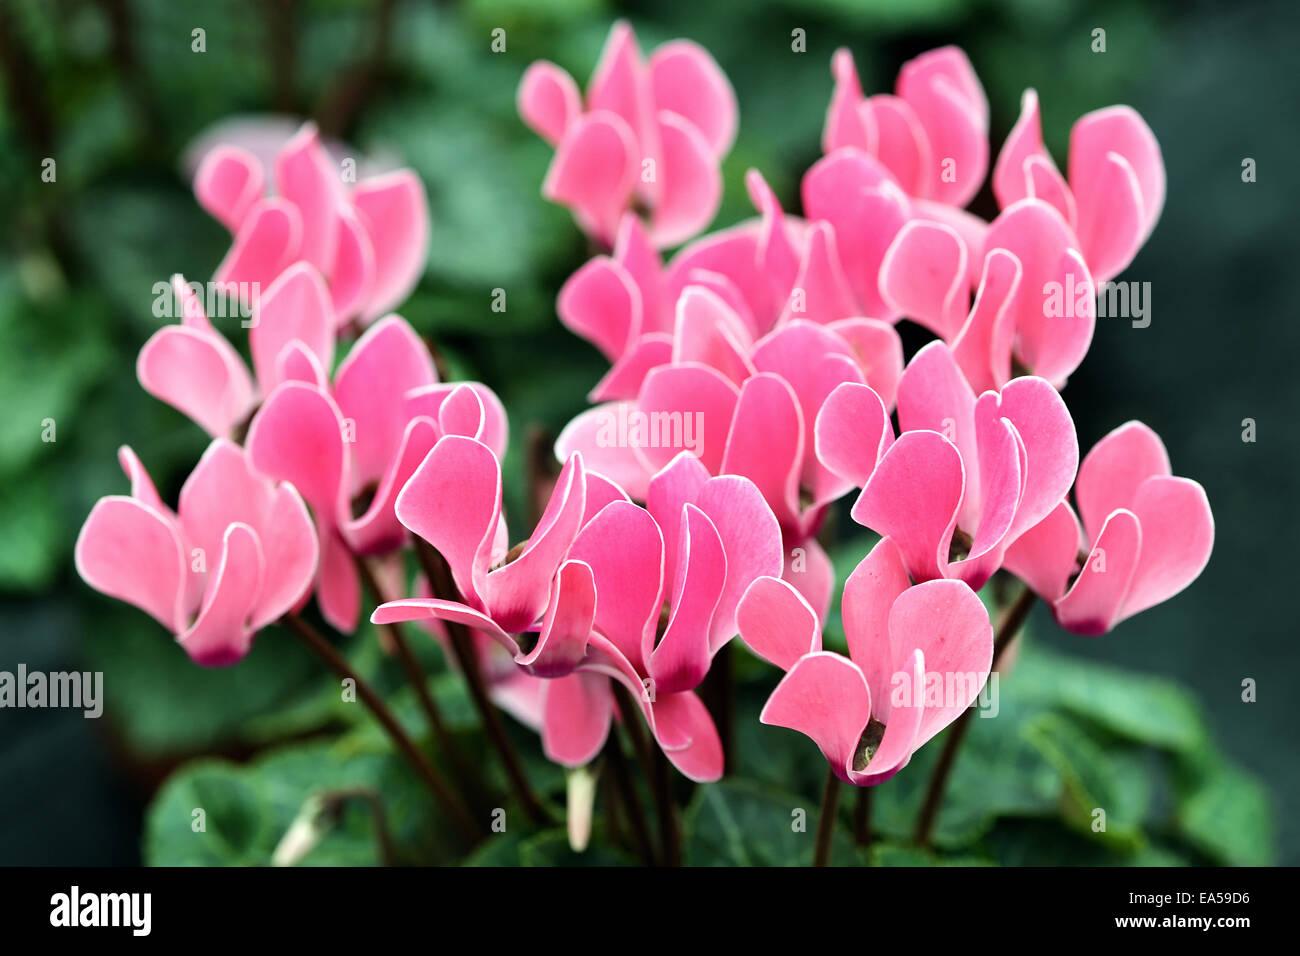 Pink cyclamen flowers - Stock Image